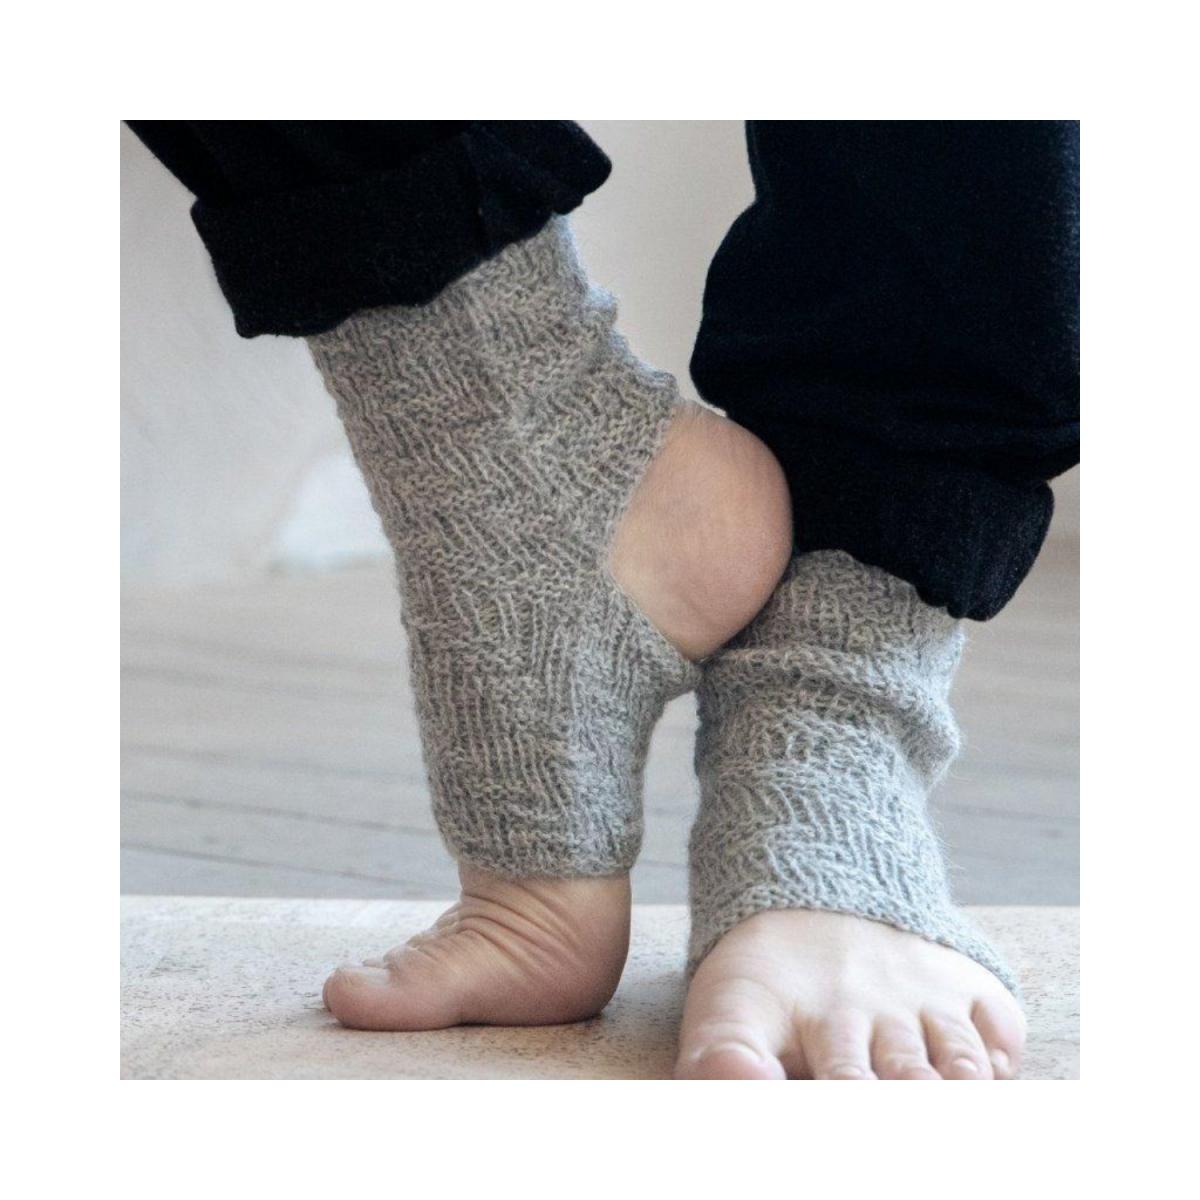 irmelin strikvarmer - fødder